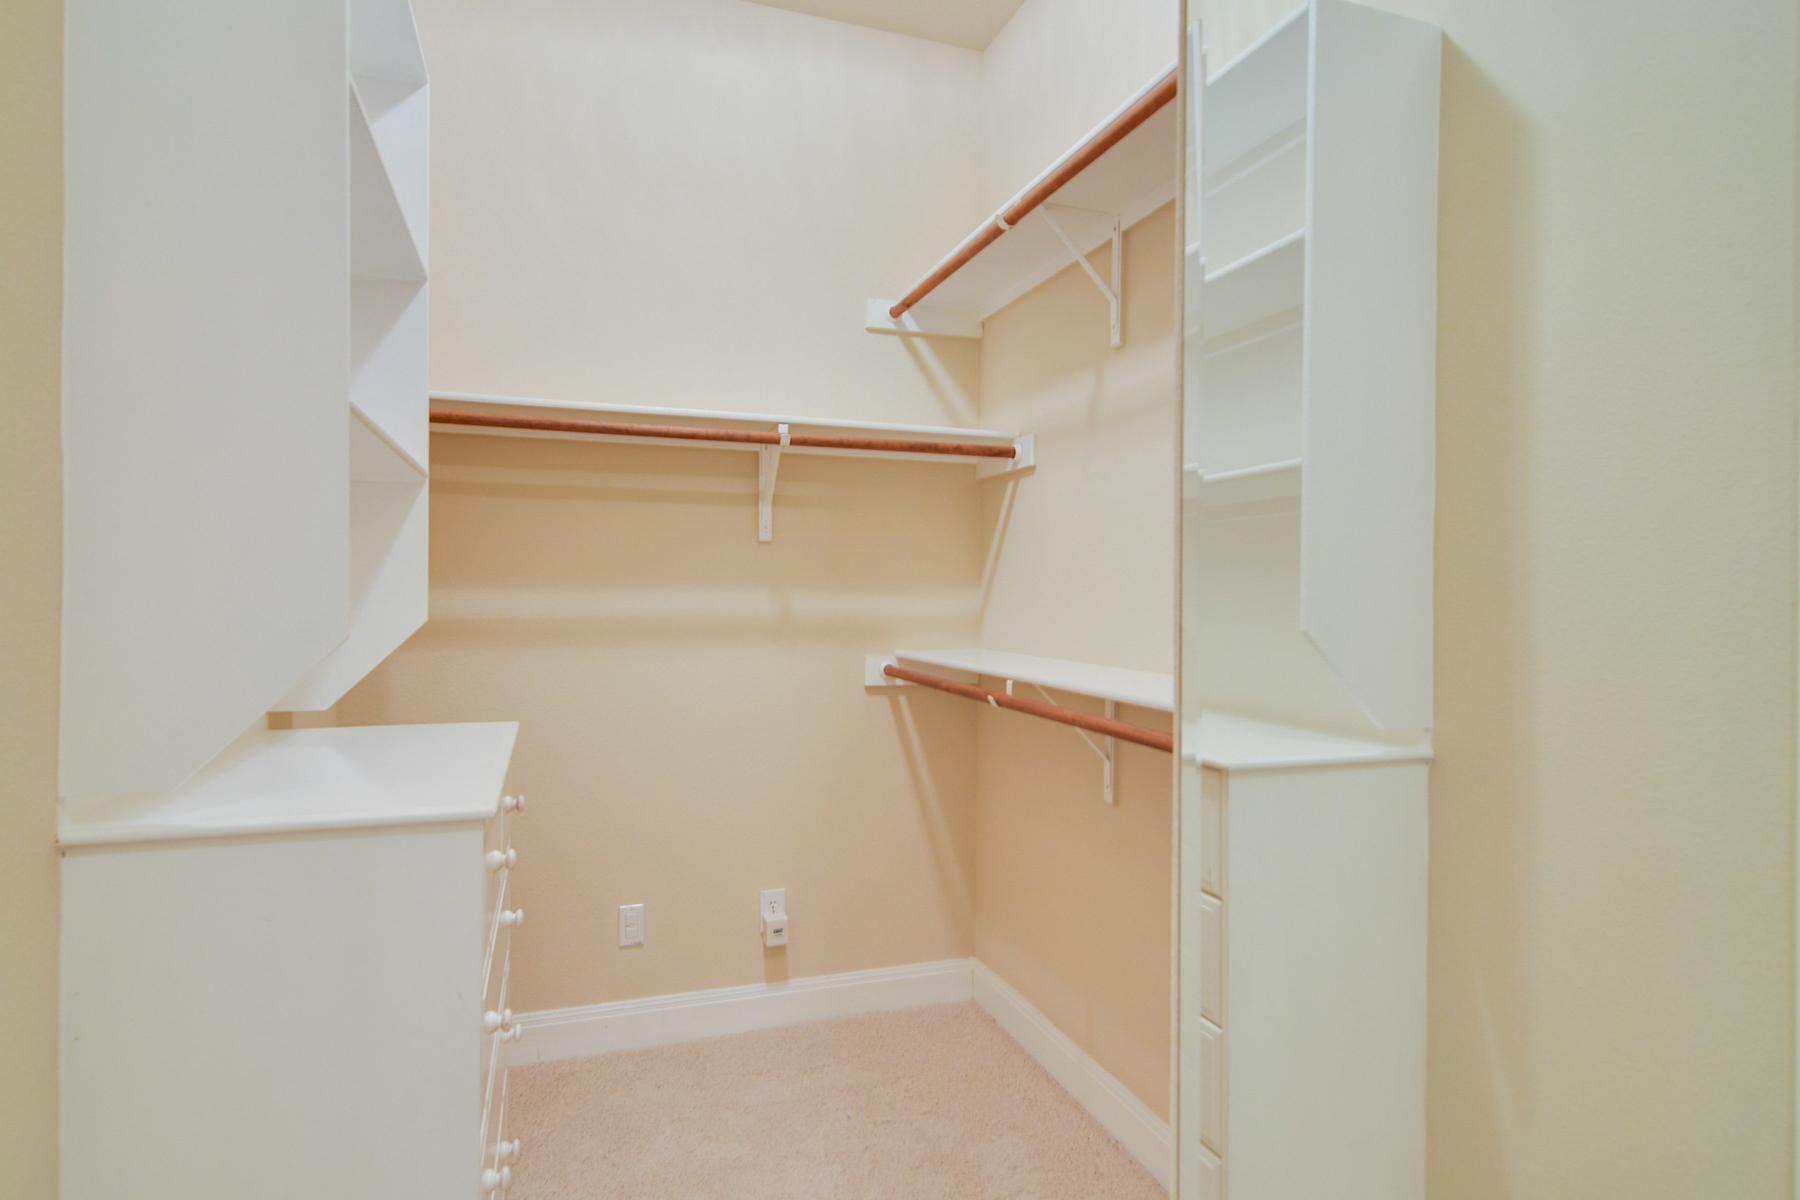 Additional photo for property listing at Gorgeous Gem in The Dominion 8 Worthsham Dr San Antonio, Texas 78257 Estados Unidos